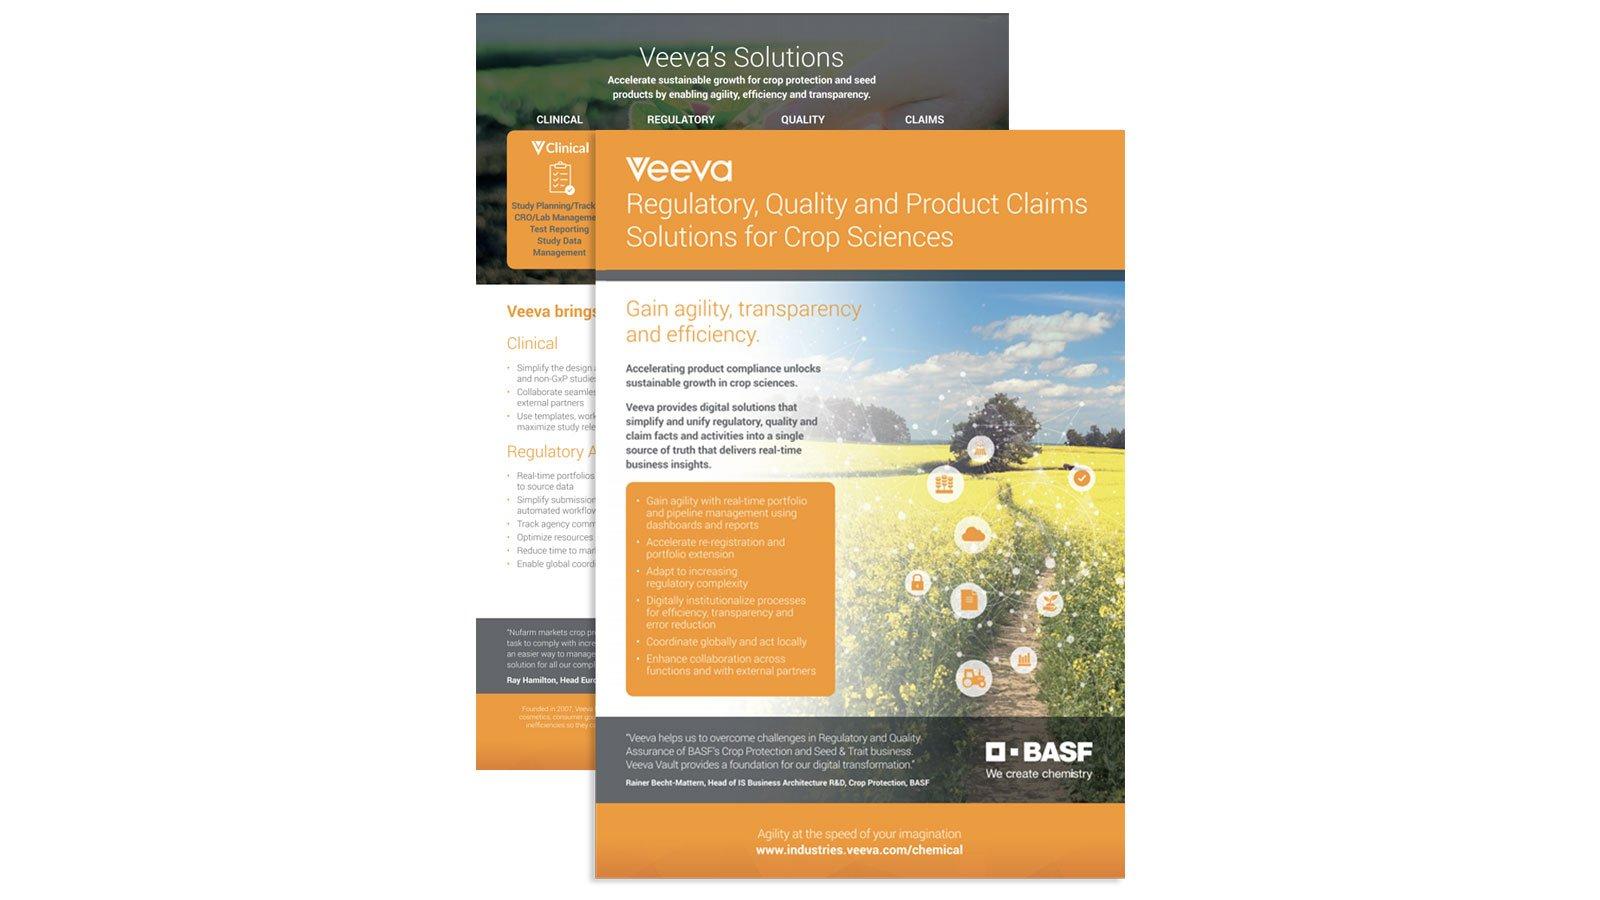 Veevas-Solutions-for-Crop-Science12